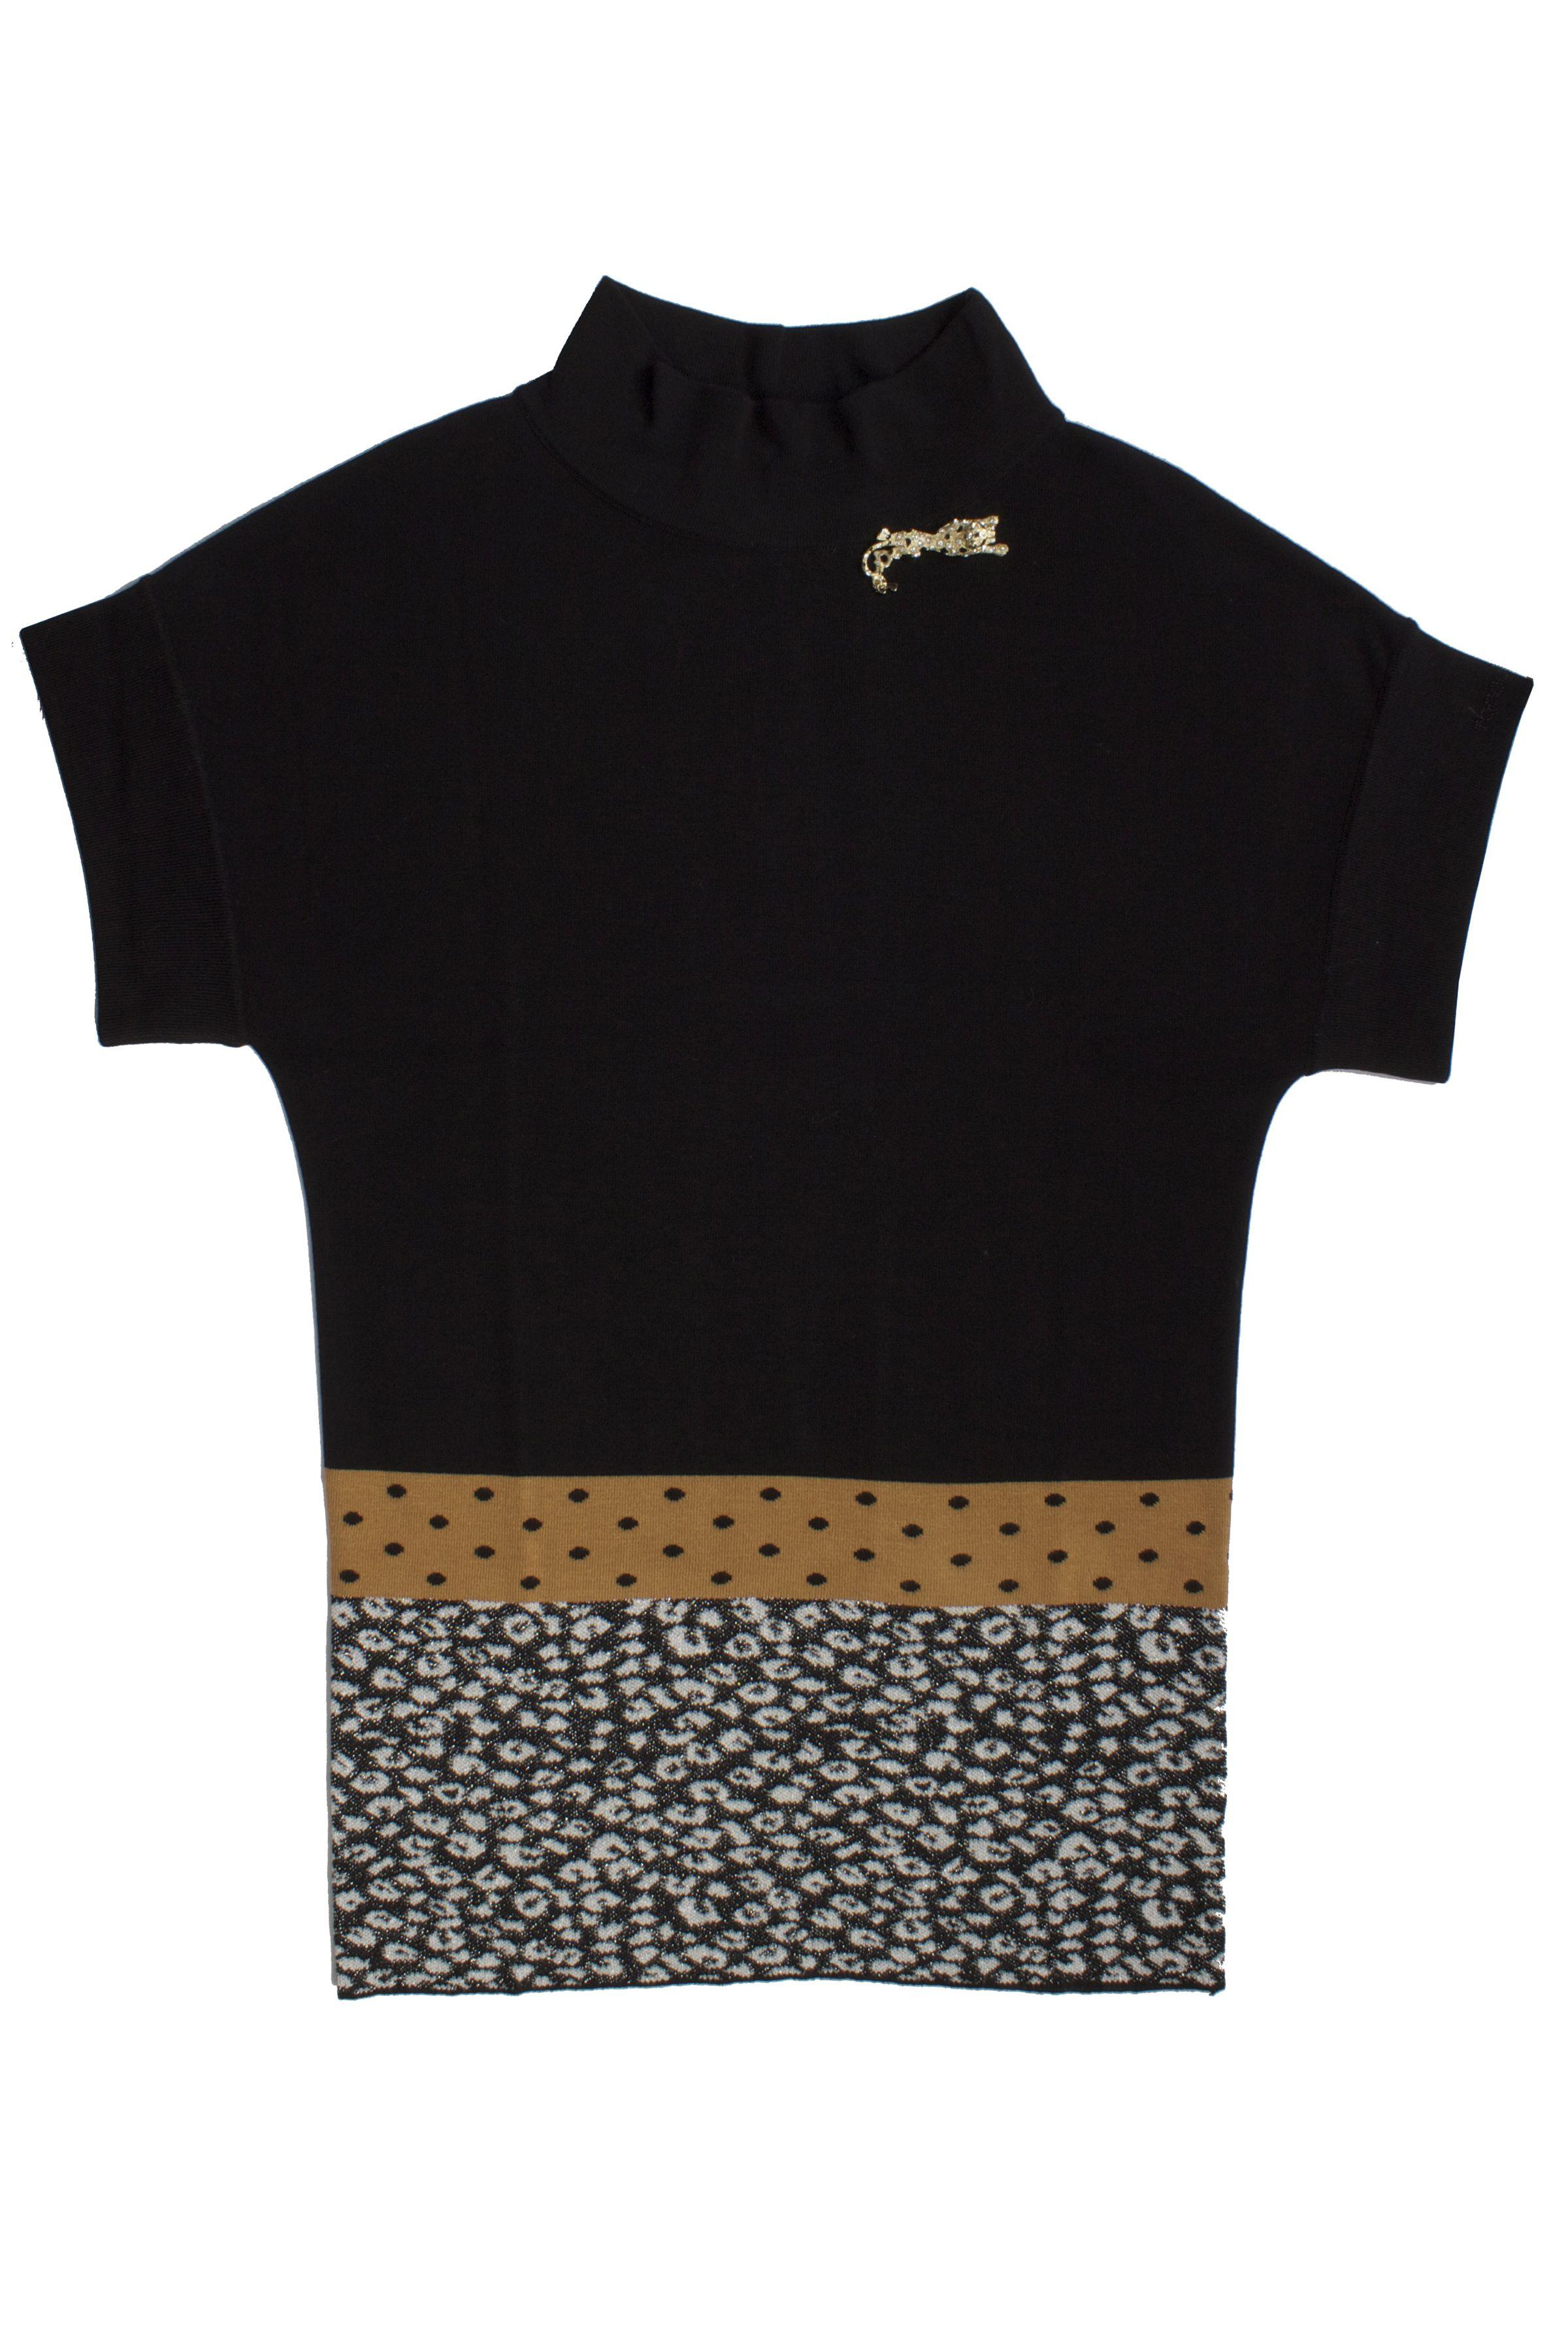 Jumper Absolutamente Rocco Barocco Knitwear magnífico nvxPqFwOx